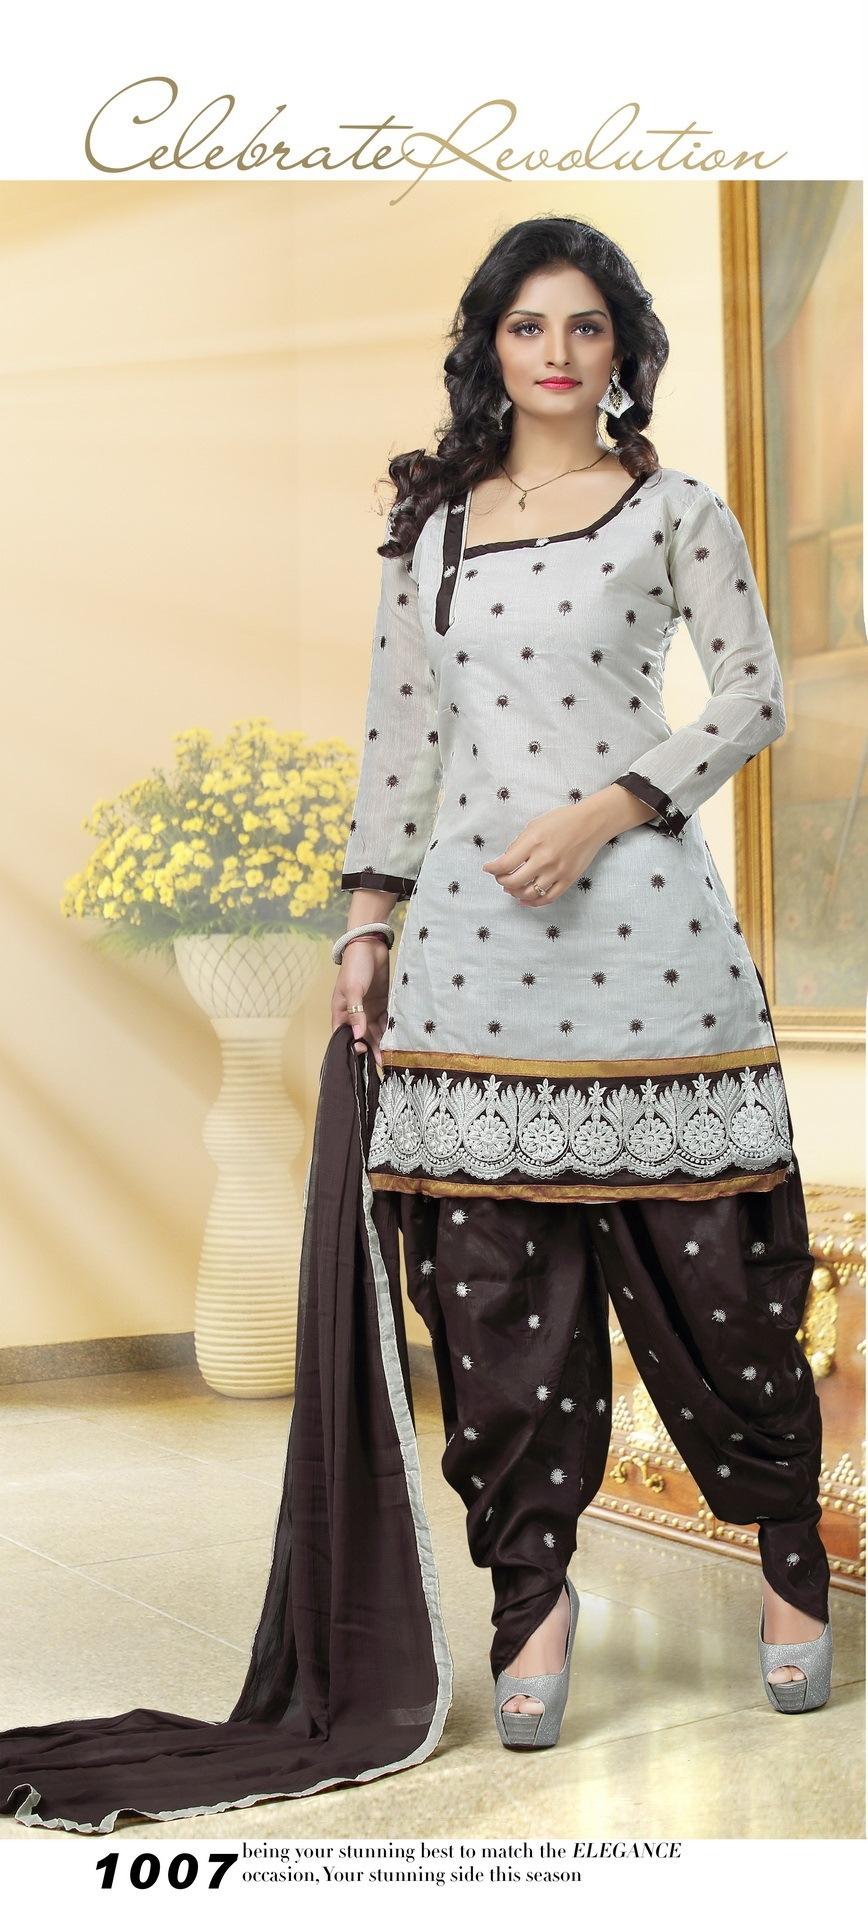 e3f88c91a6 Odin Paris Salwar Kameez Designer Patiala Dress Indian Suit Punjabi Suit  Patiala Suit 3